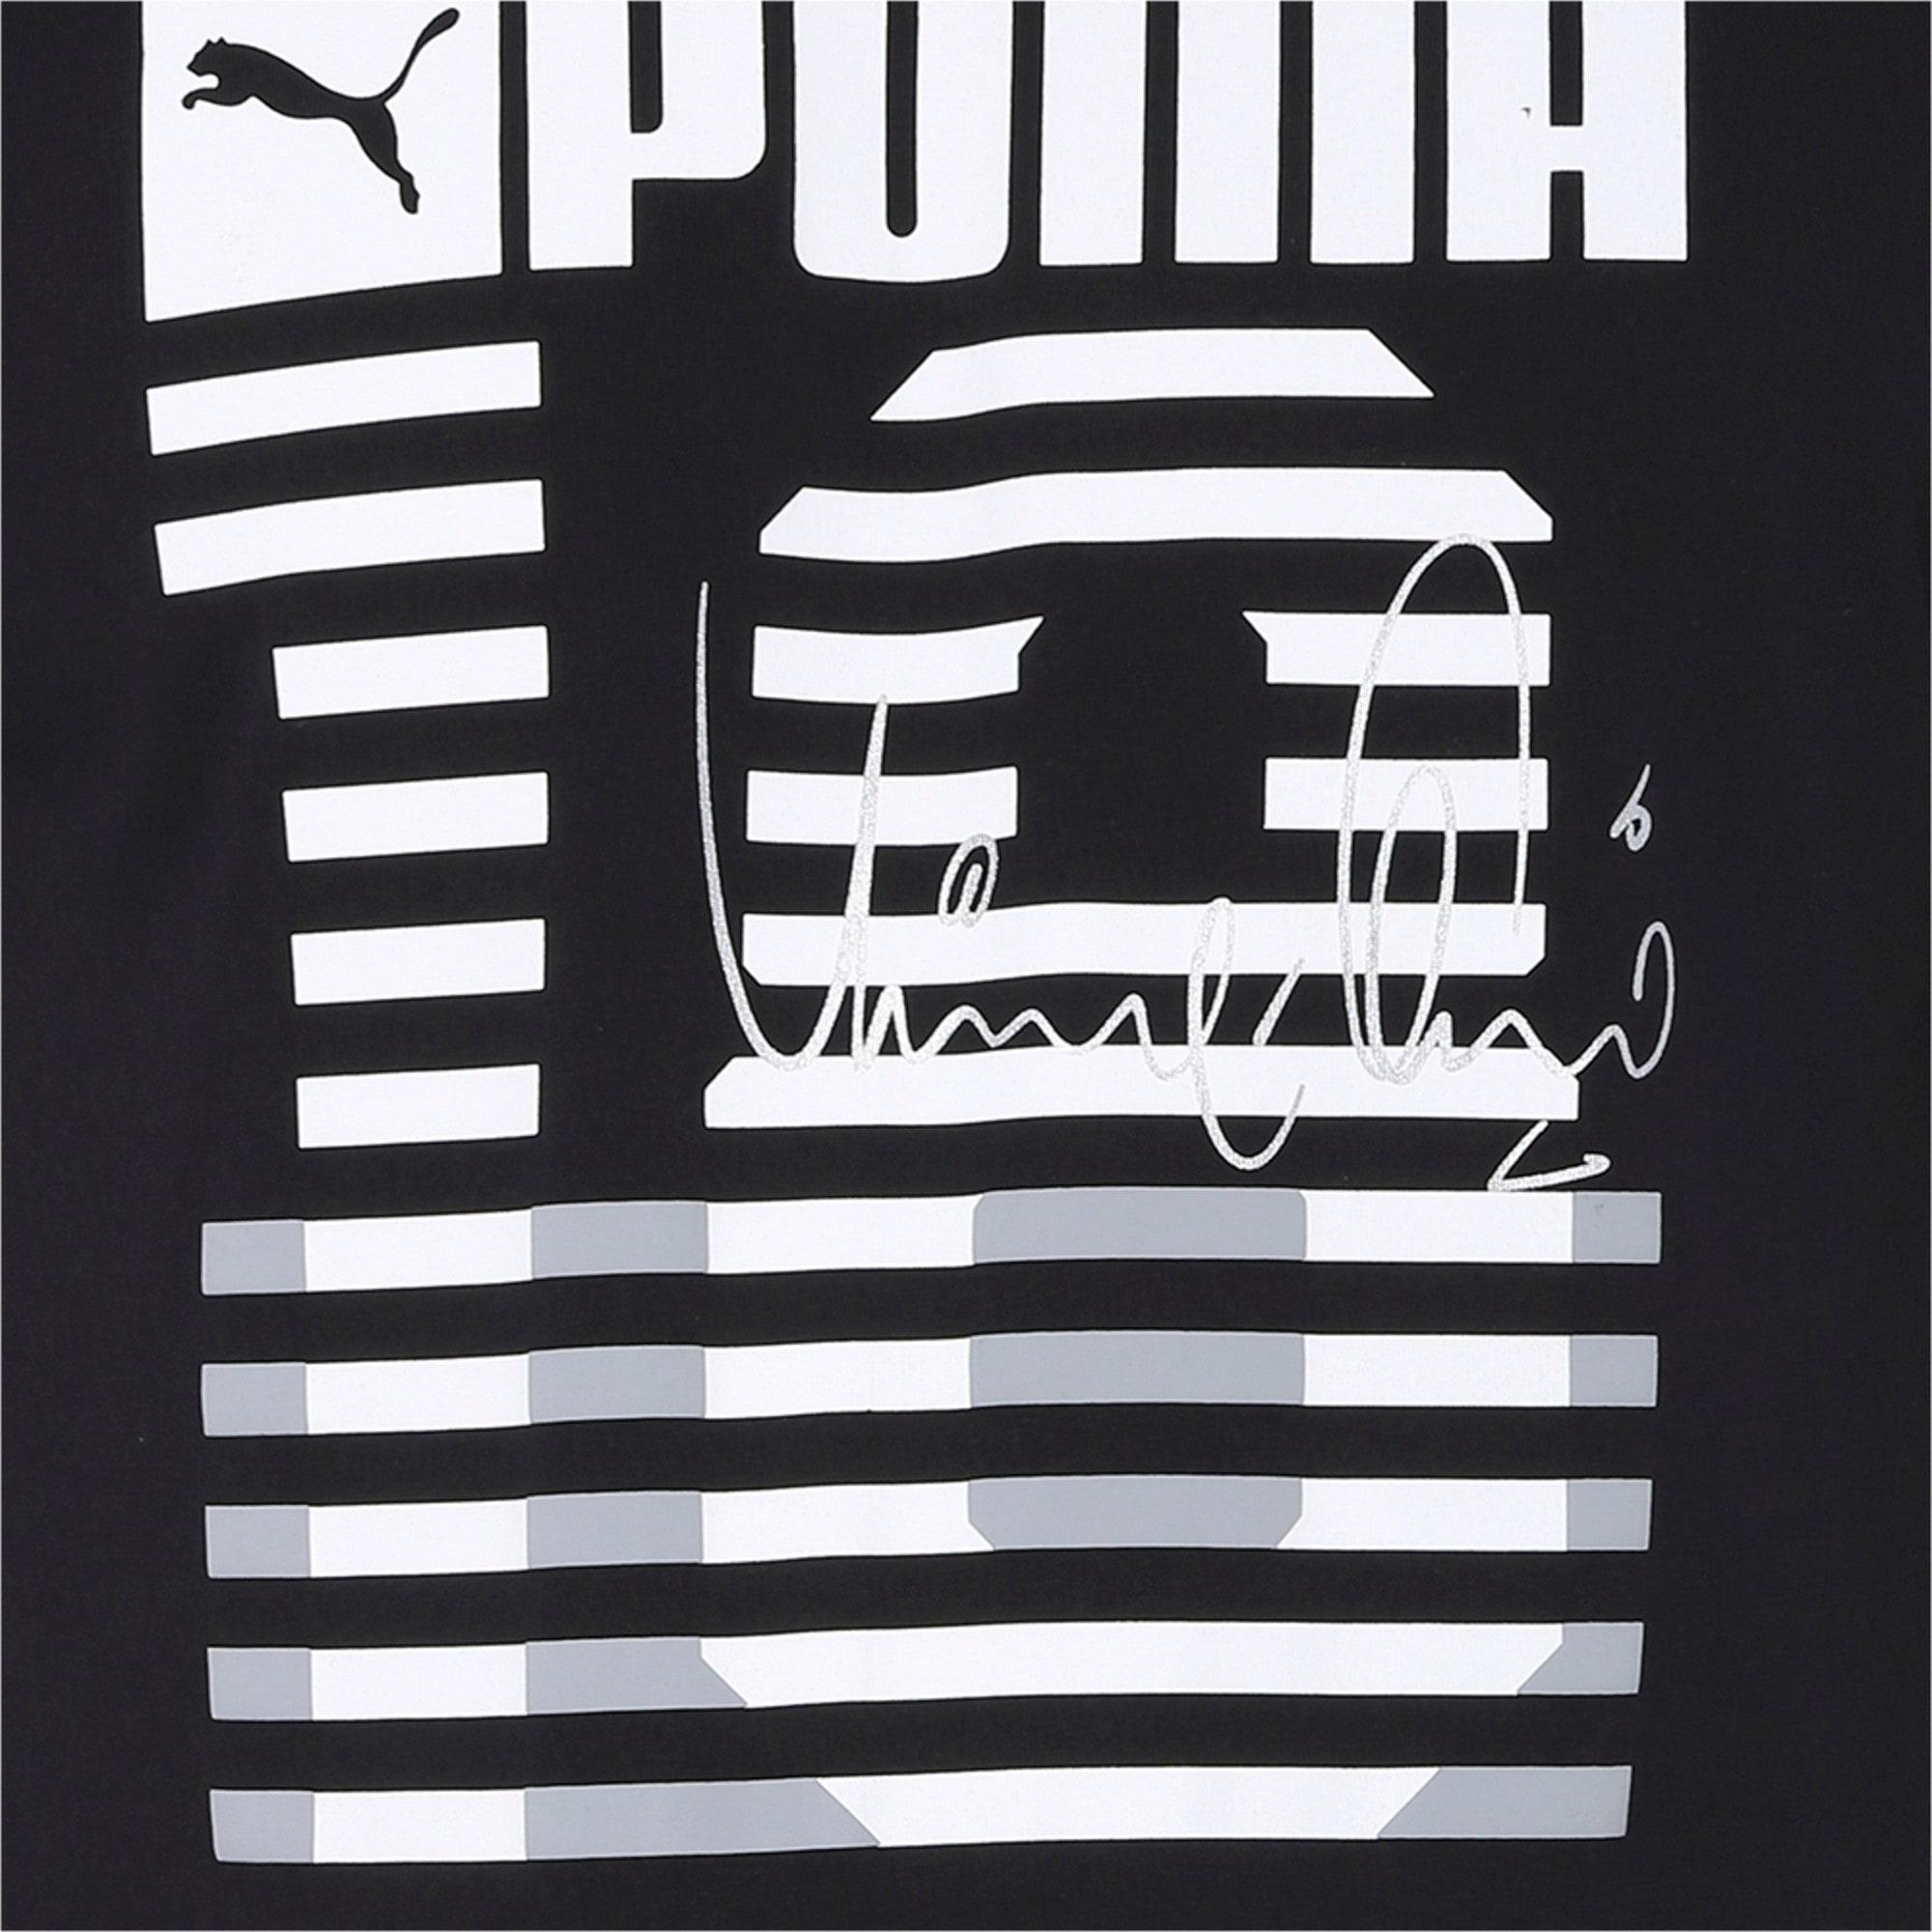 Thumbnail 6 of one8 Men's Graphic Tee, Puma Black, medium-IND